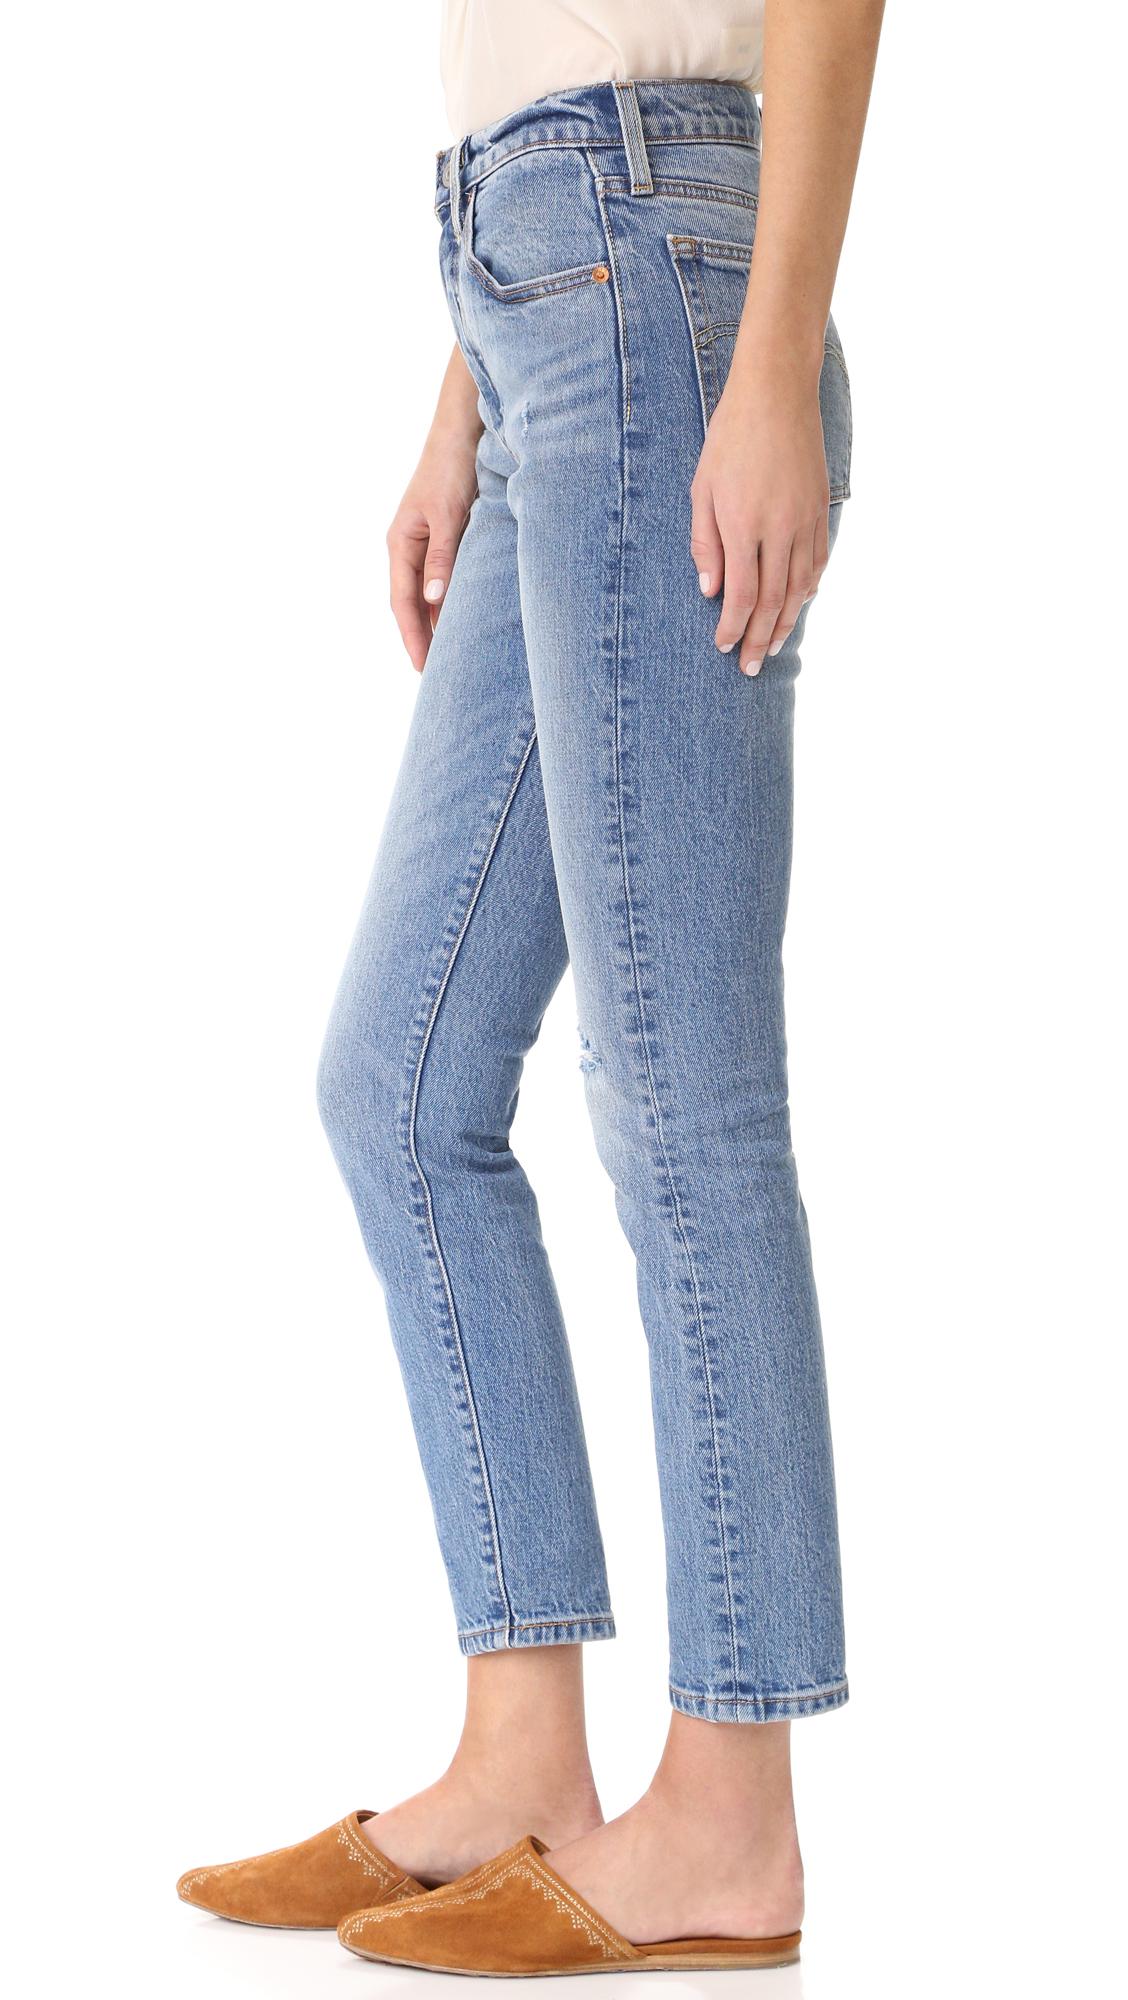 acda042b8b20c Levi s 501 Skinny Jeans